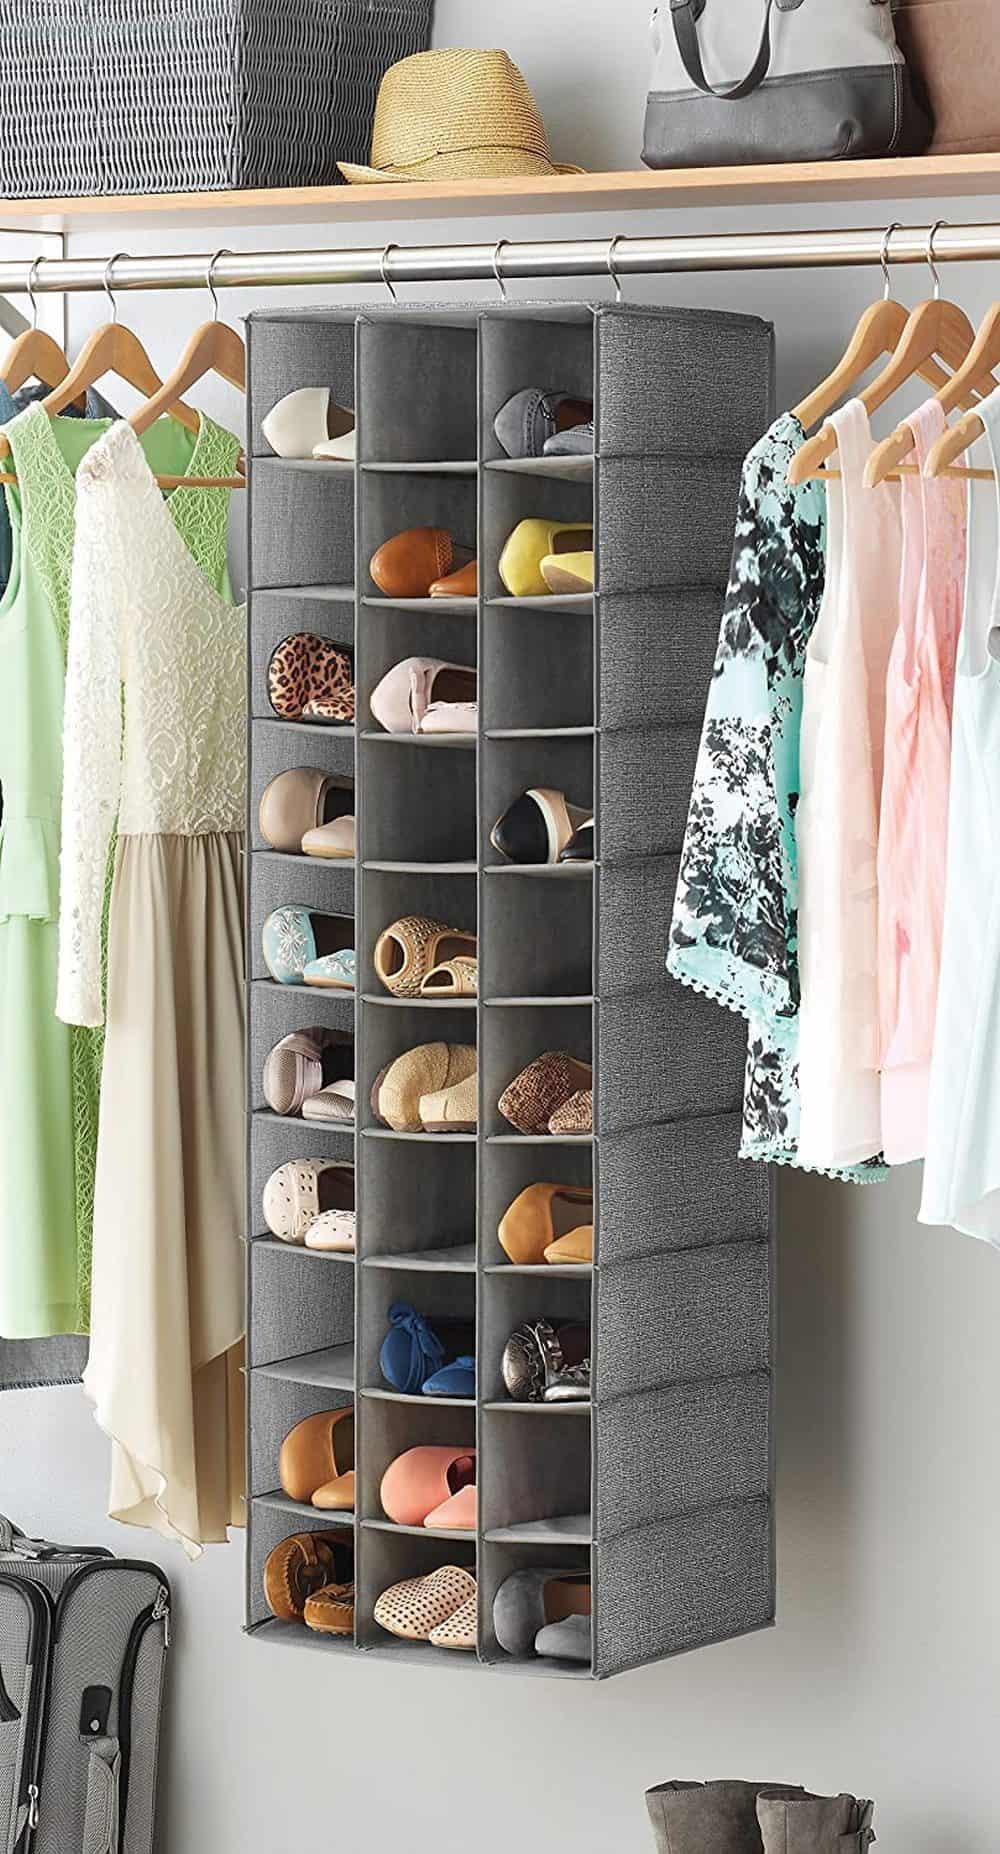 Whitmor 30-Section Hanging Shoe Shelves